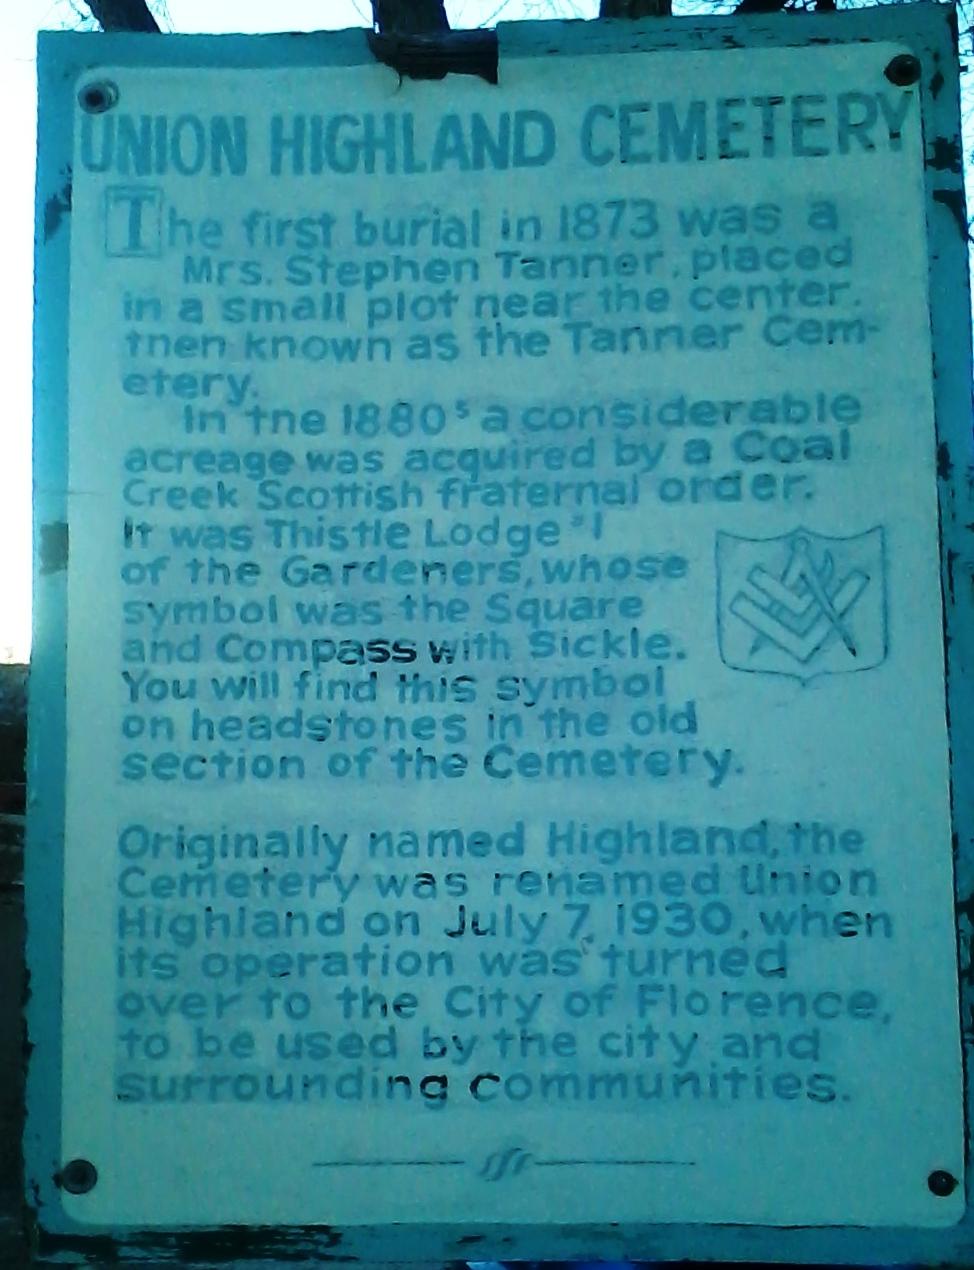 Union Highland Cemetery